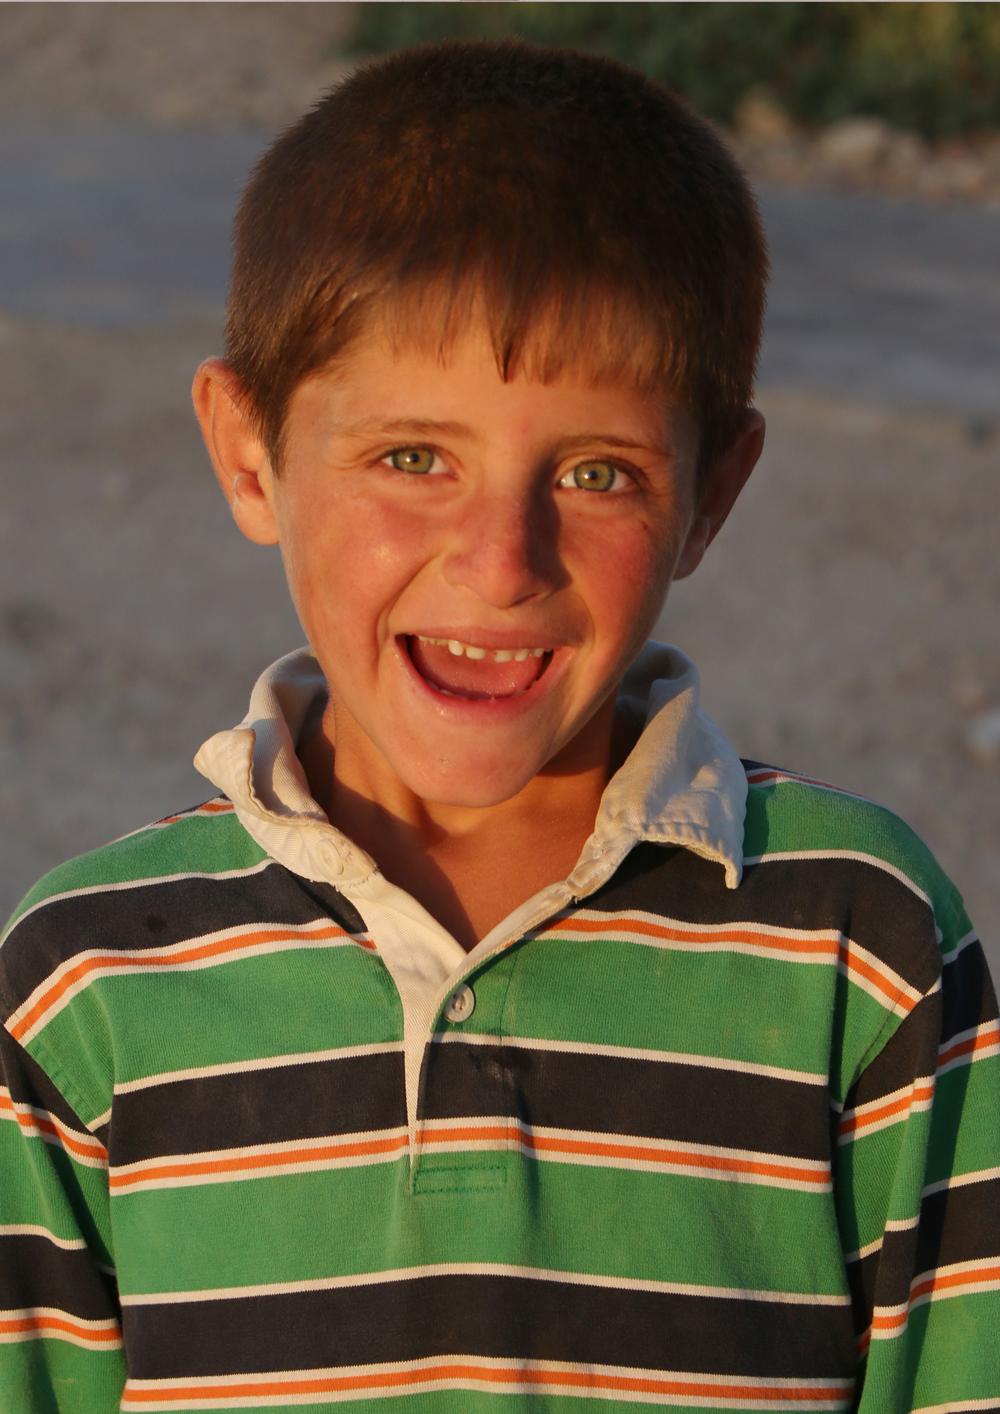 Syrian boy refugee portrait